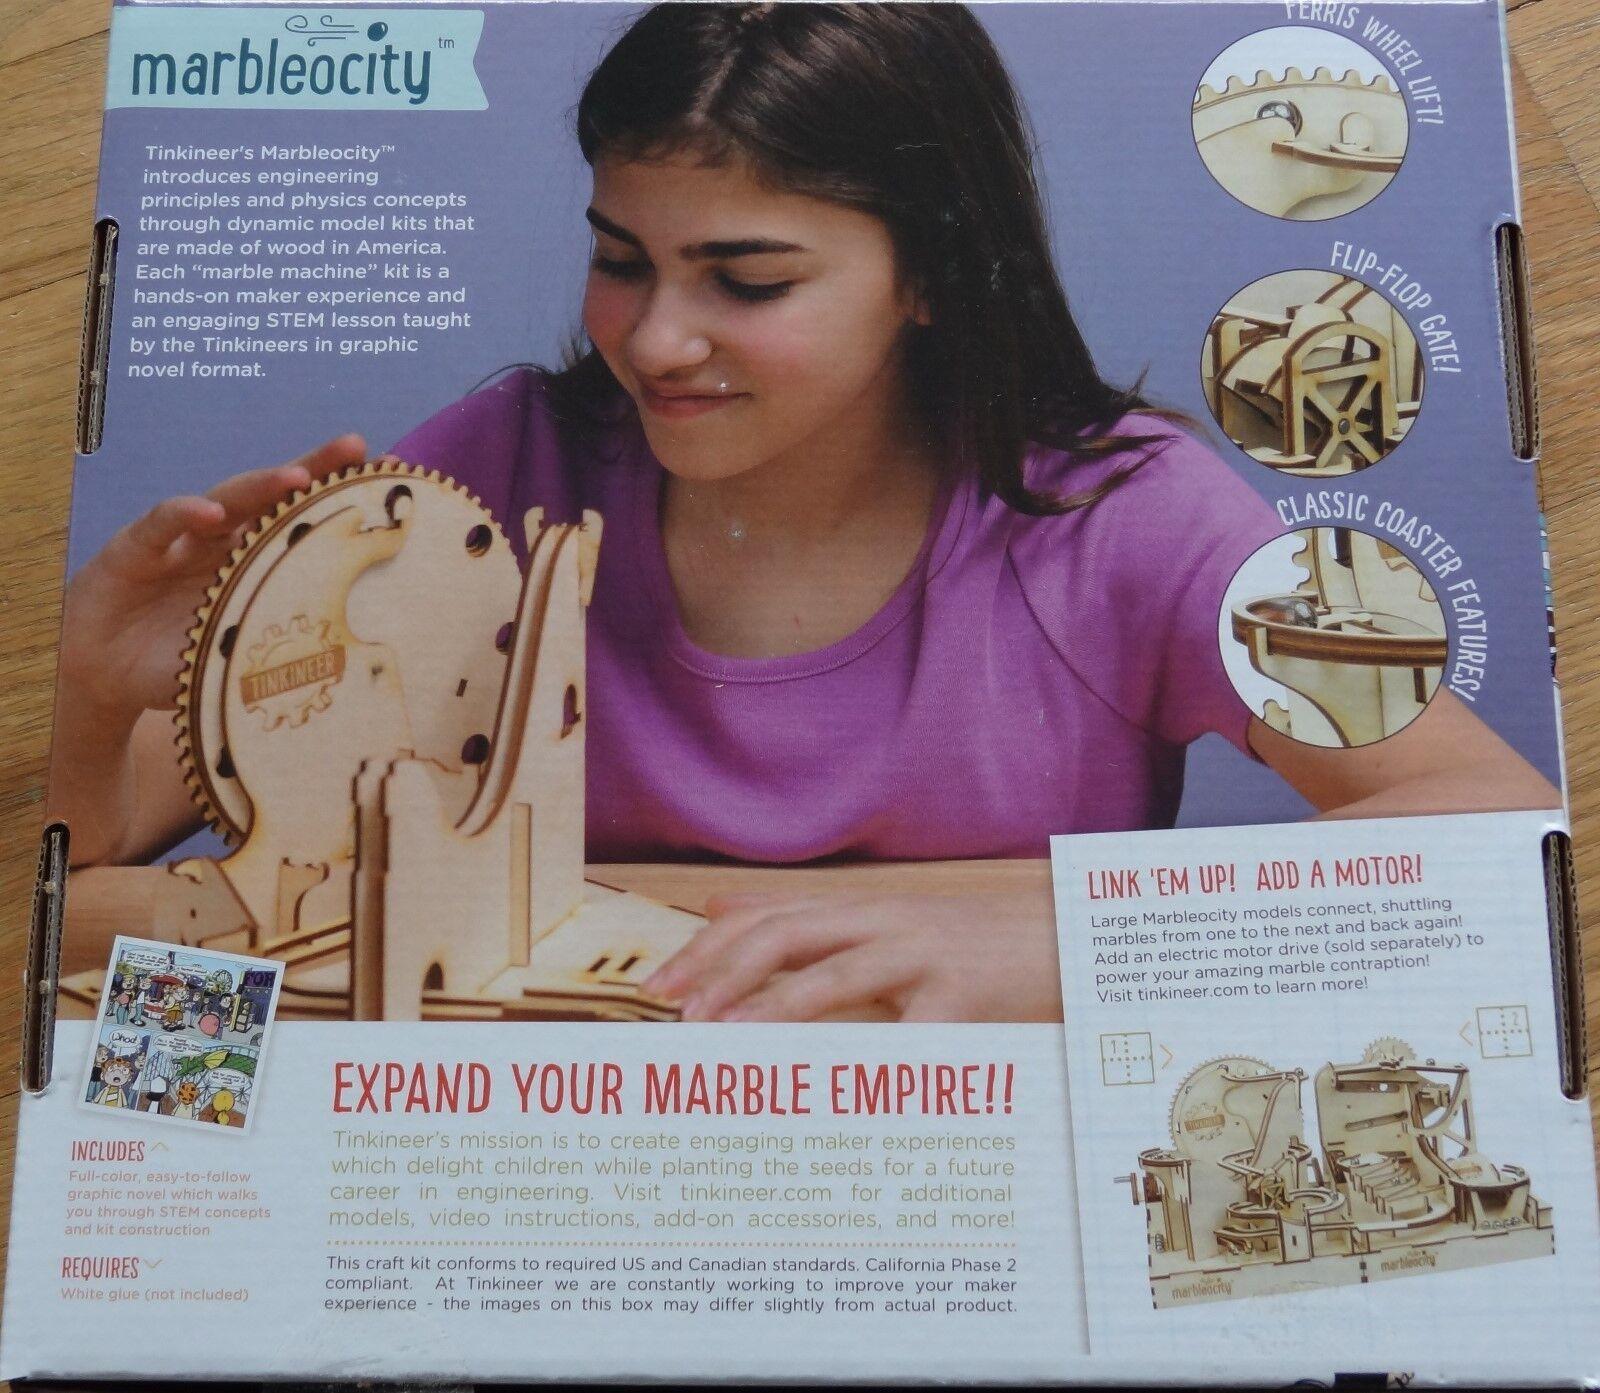 Dragon Coaster Maker Maker Maker Kit Tinkineer Marbleocity Marble Run MADC100BB 9735e3